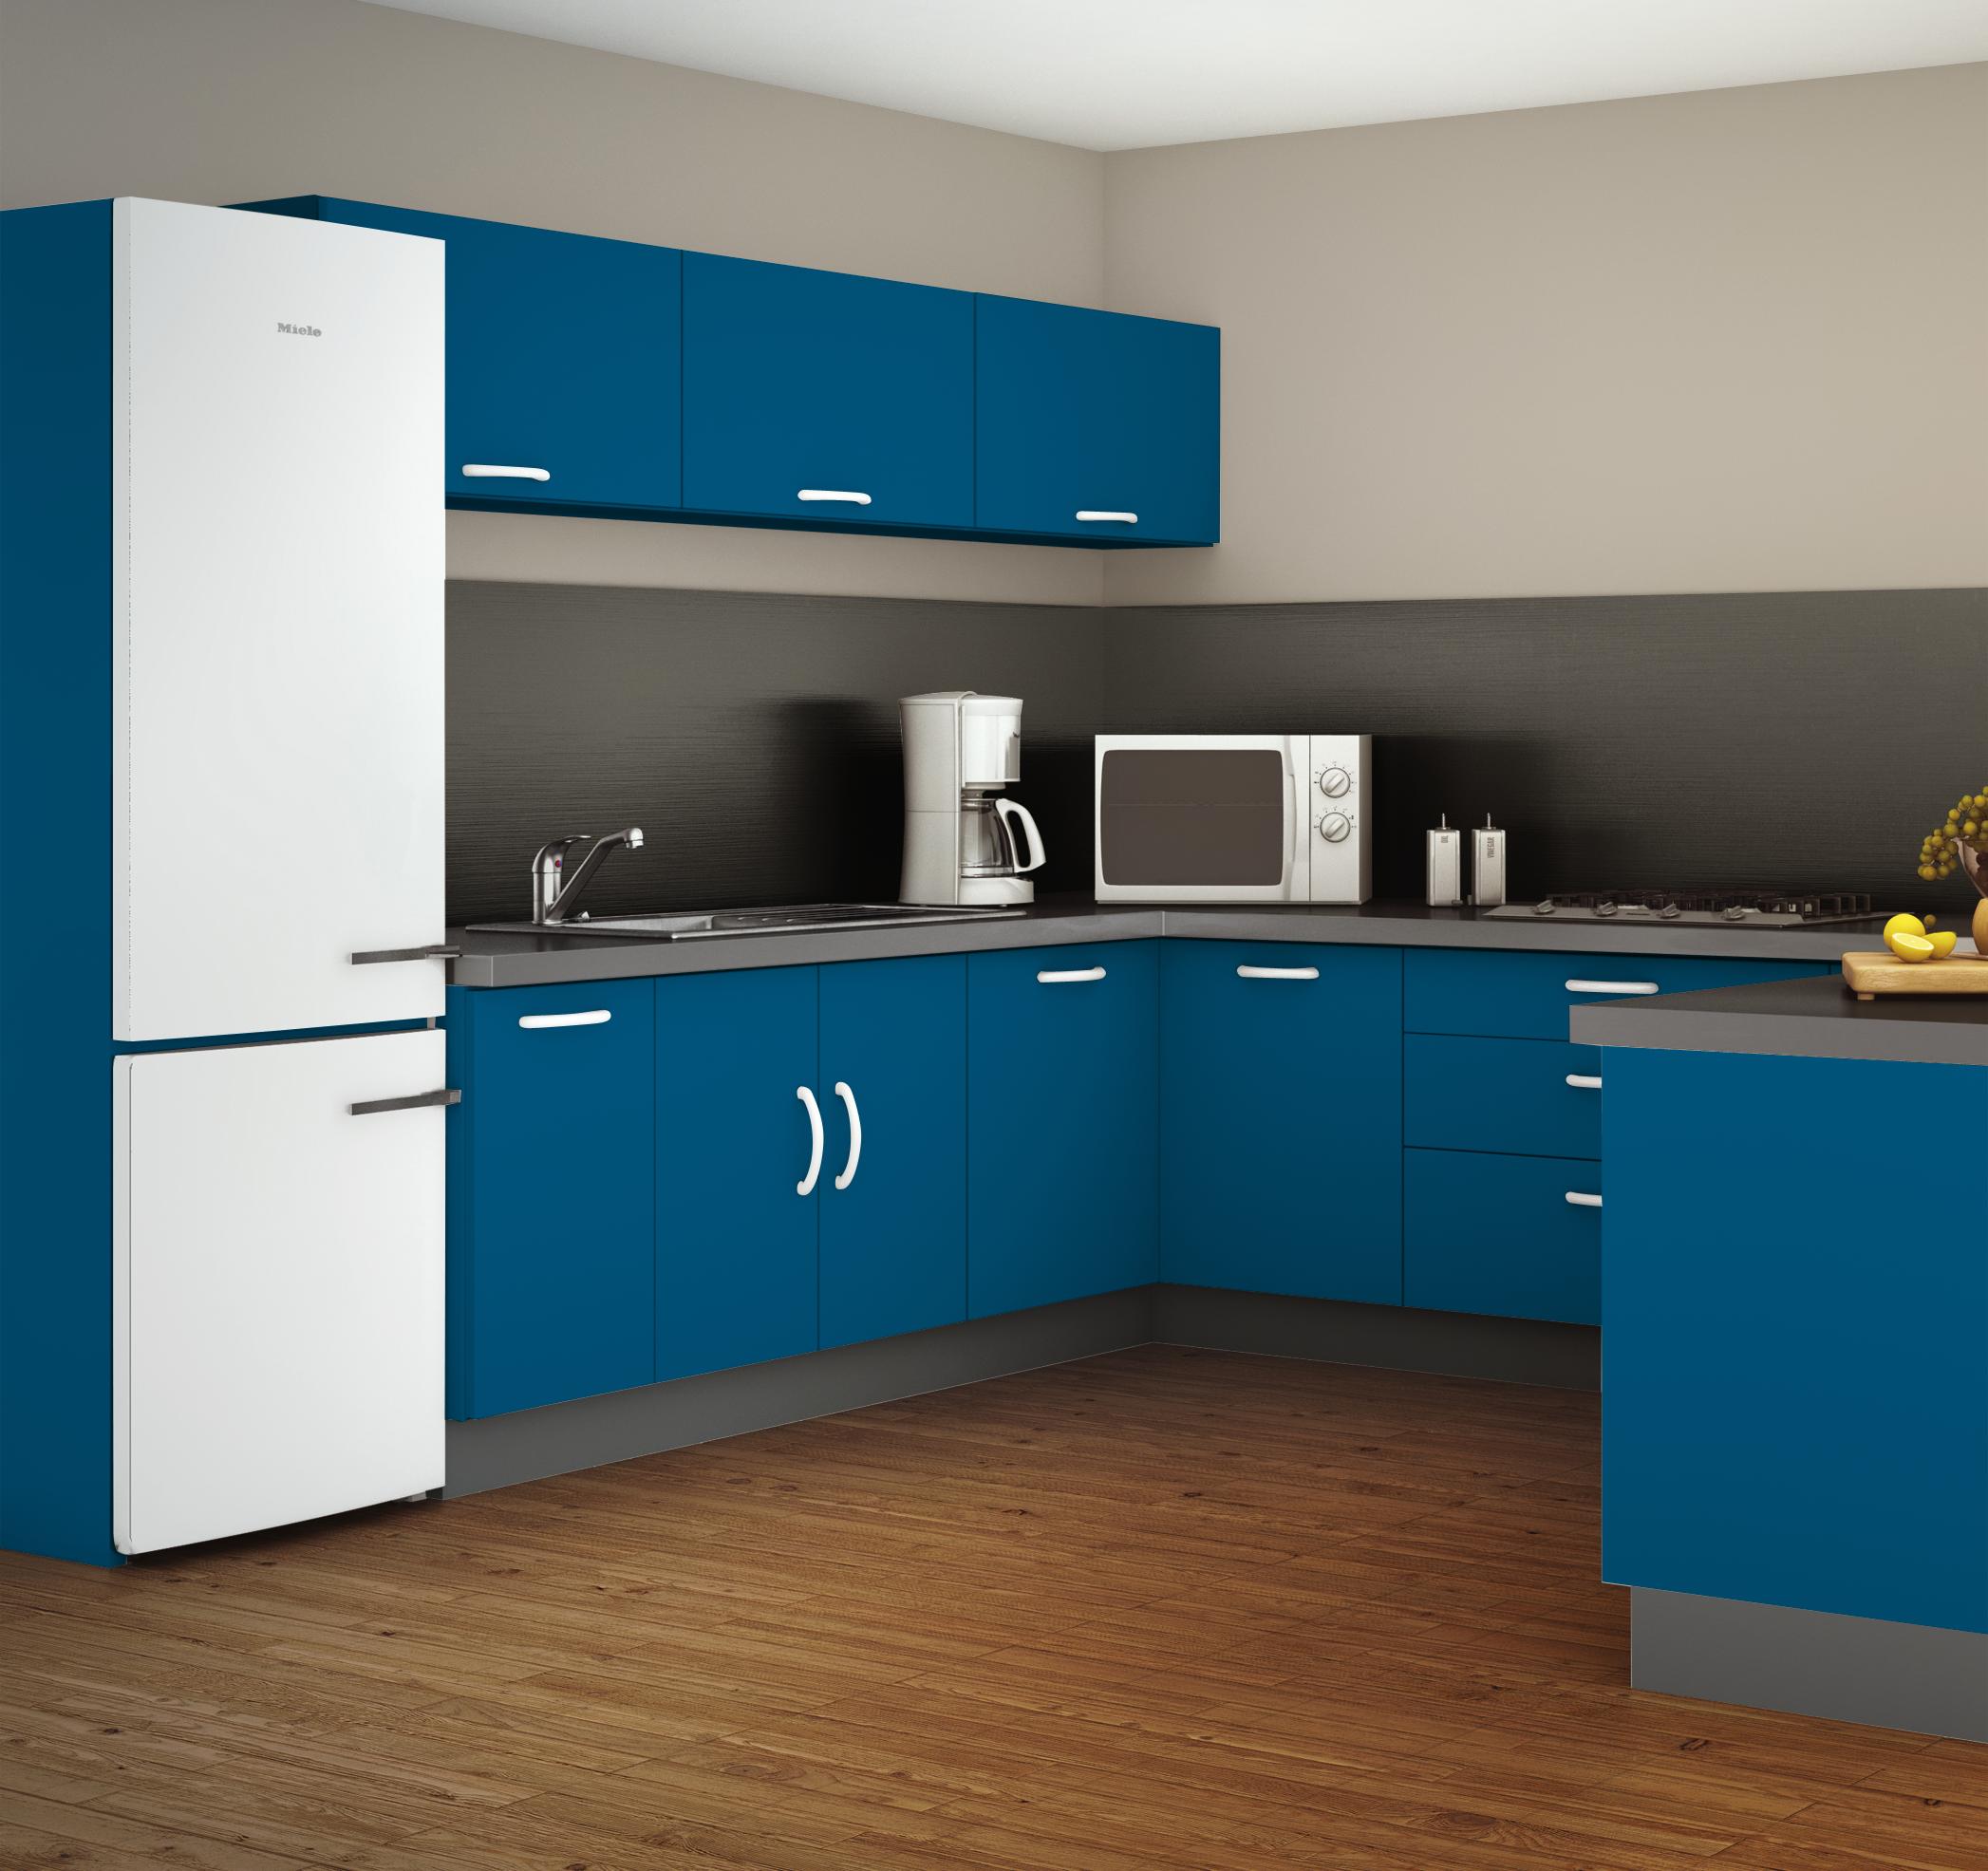 esprit zen simulation avec la teinte bleu tajine. Black Bedroom Furniture Sets. Home Design Ideas